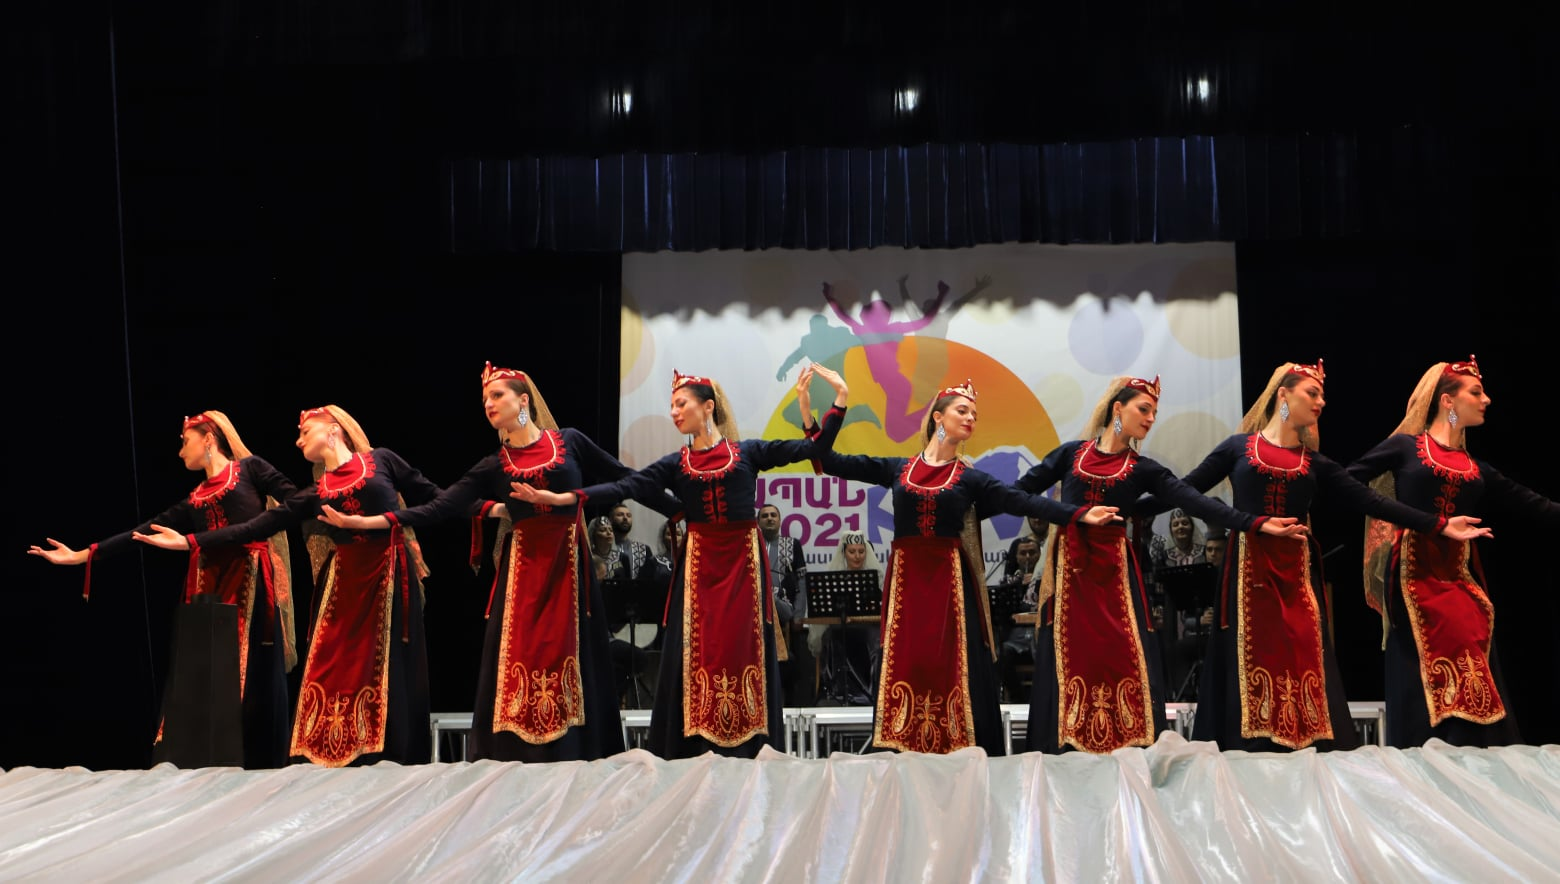 Photo of Կապանը 2021 թ. Հայաստանի Երիտասարդական մայրաքաղաքն է